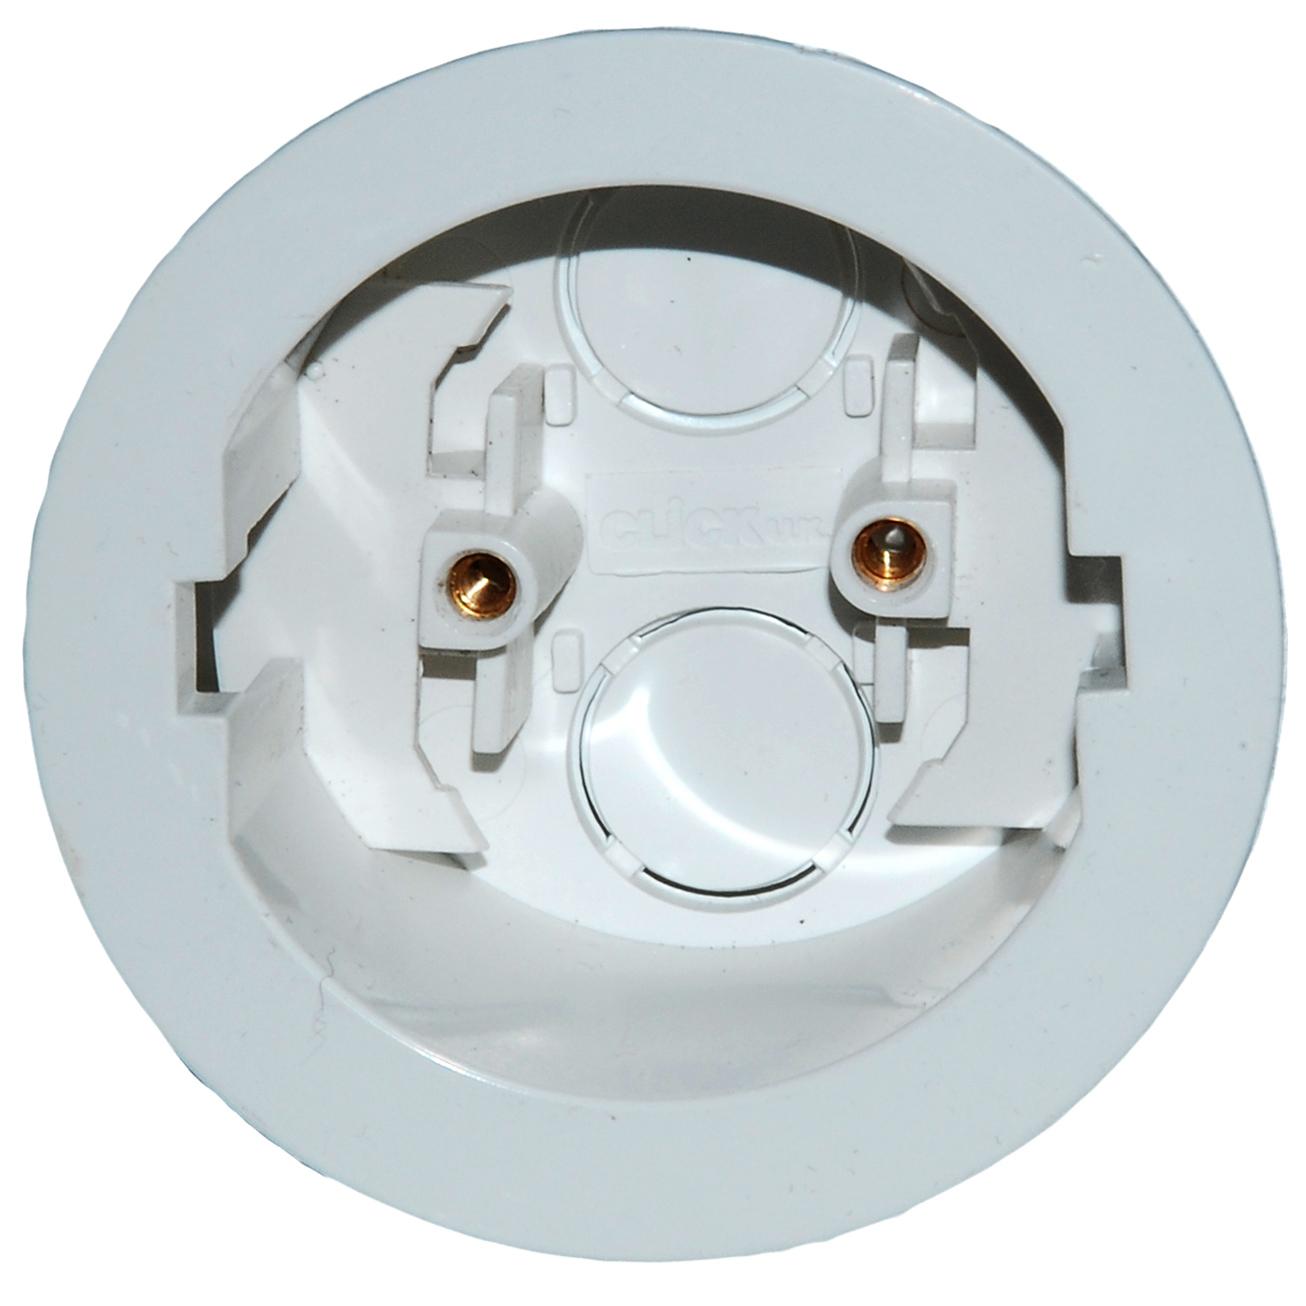 Circular Wiring Box - Product Wiring Diagrams •